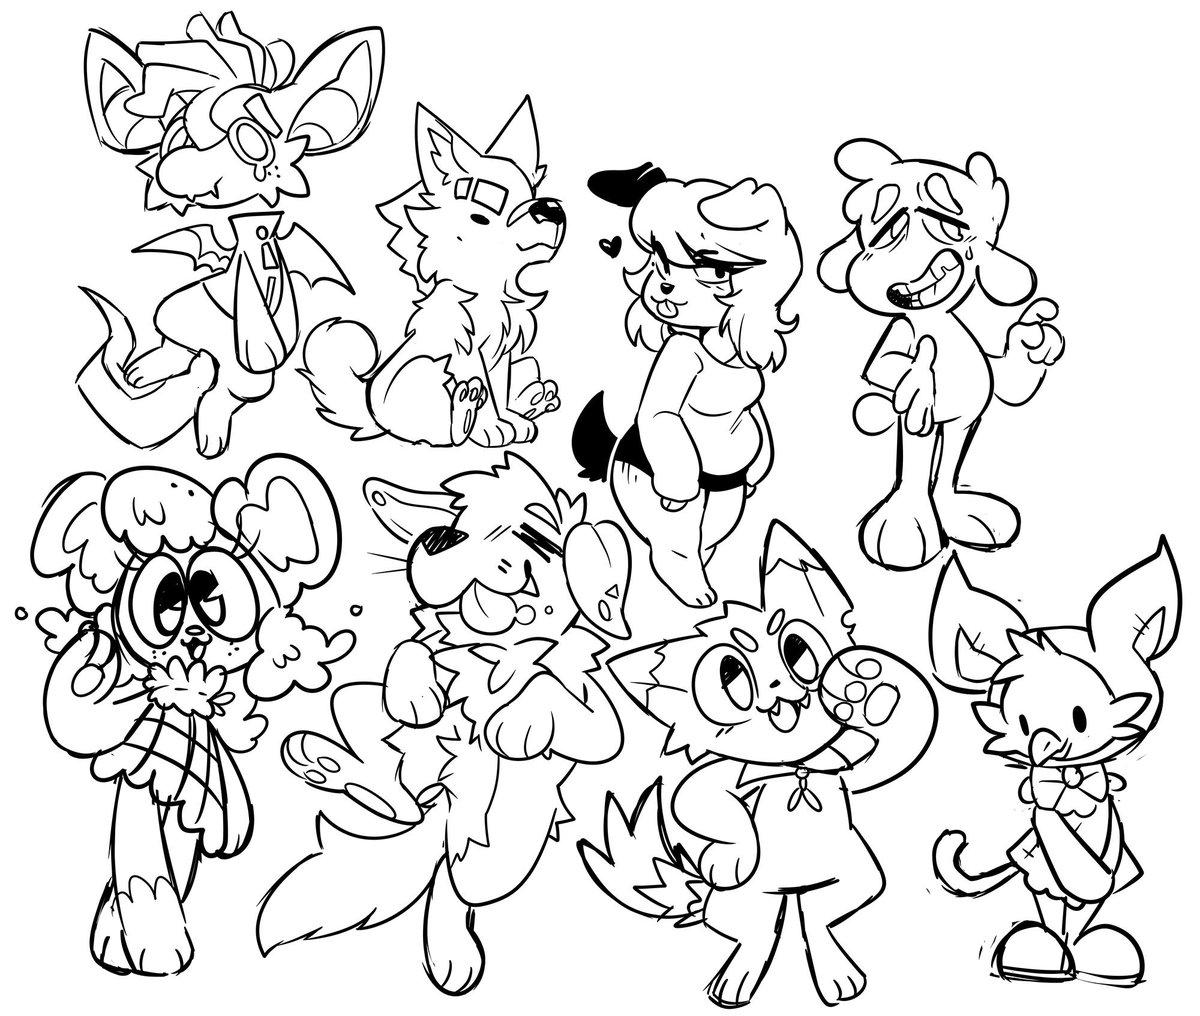 First batch of oc doodles<br>http://pic.twitter.com/0Vz2yjrT54